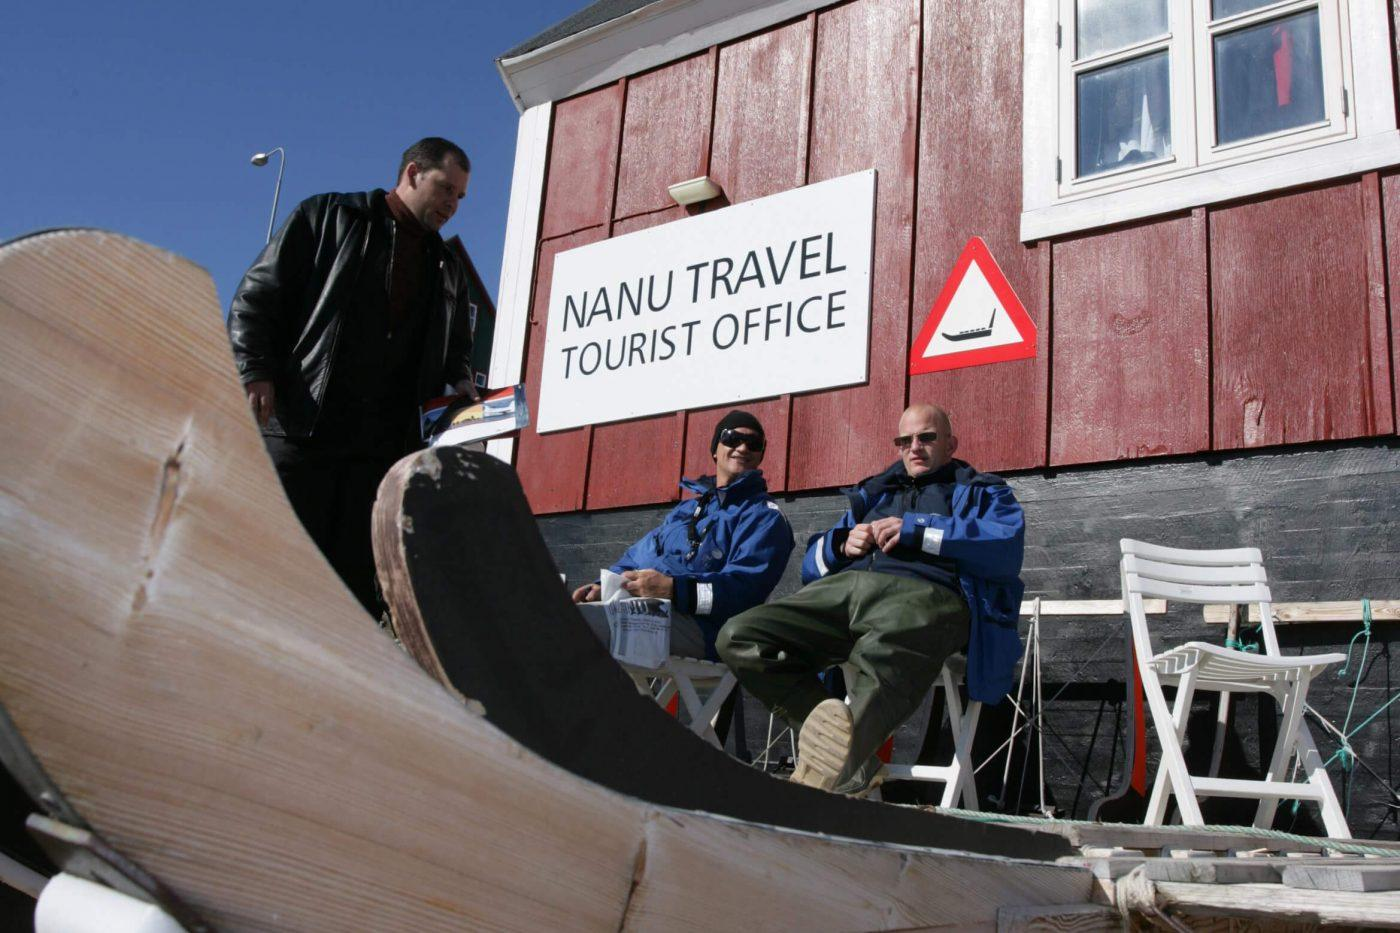 Three men enjoying the sun in front of Nanu Travel Tourist Office. Photo by Nanu Travel